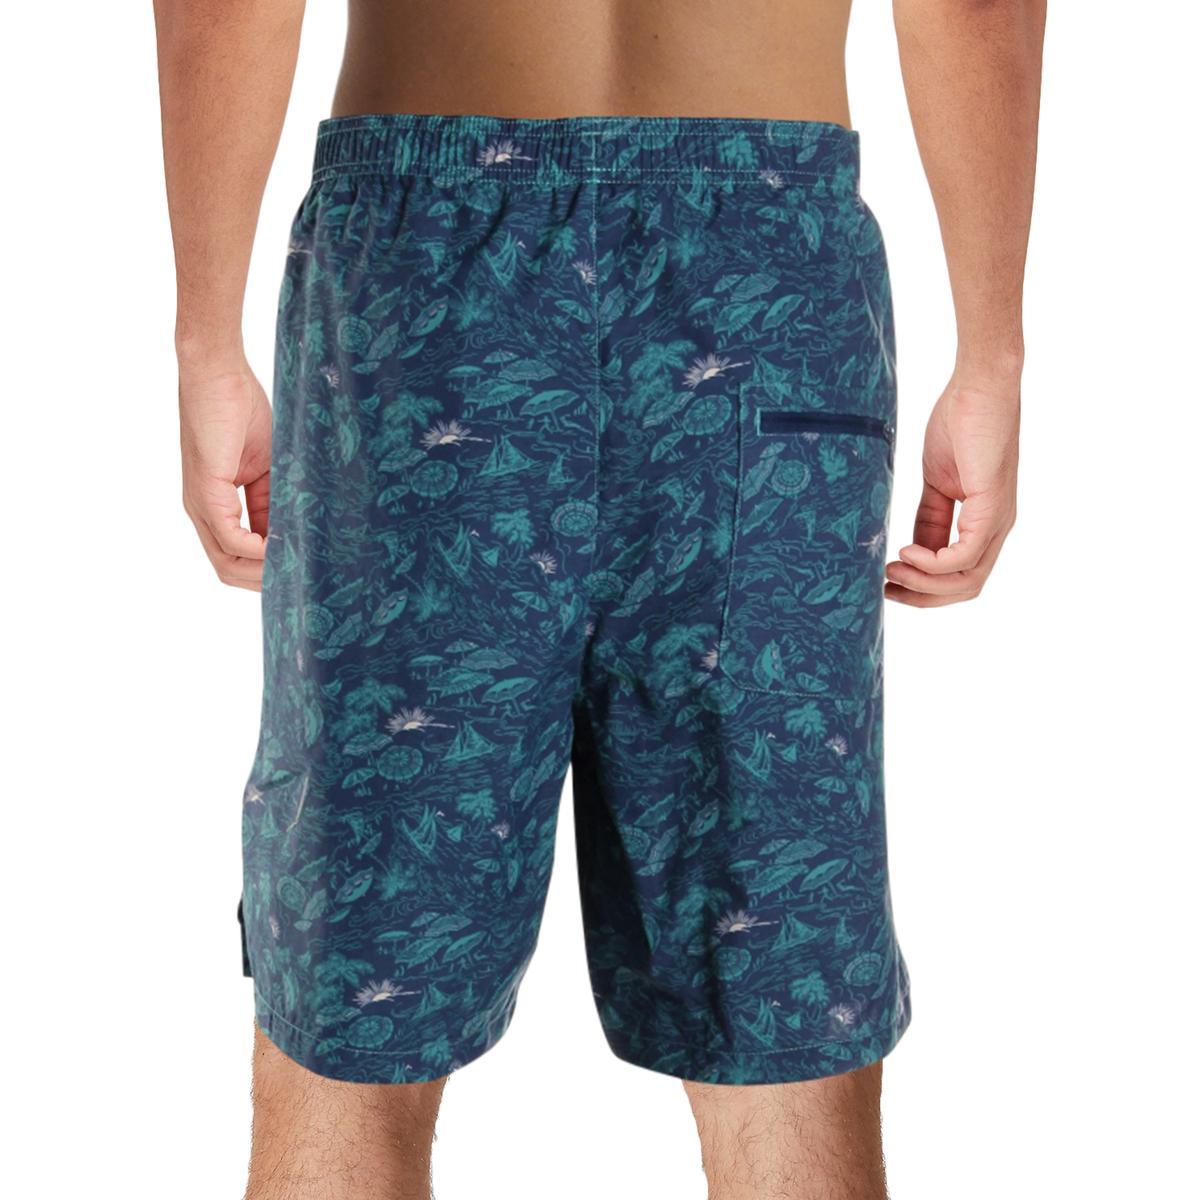 Columbia-Mens-Big-Dippers-Printed-Swim-Trunks-Swimsuit-Big-amp-Tall-BHFO-5580 thumbnail 9